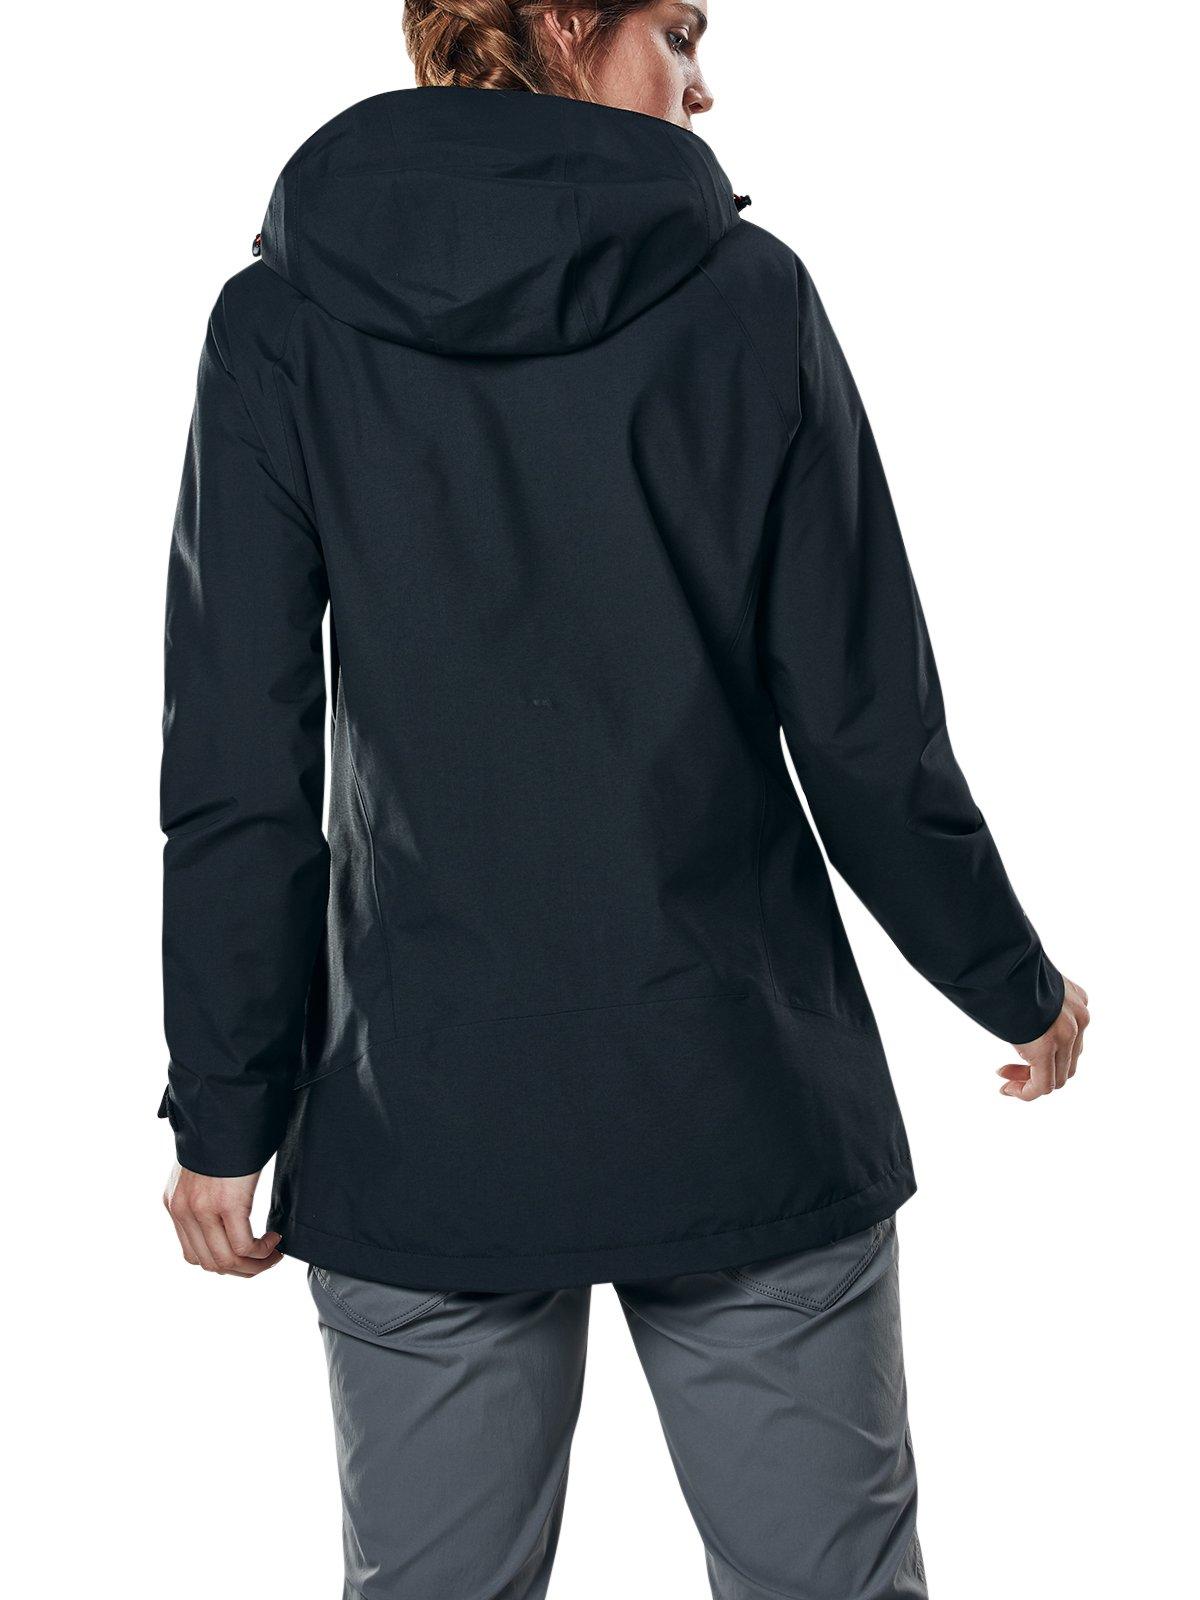 71wGw 0dyJL - Berghaus Women's Hillmaster Gore-tex Waterproof Jacket